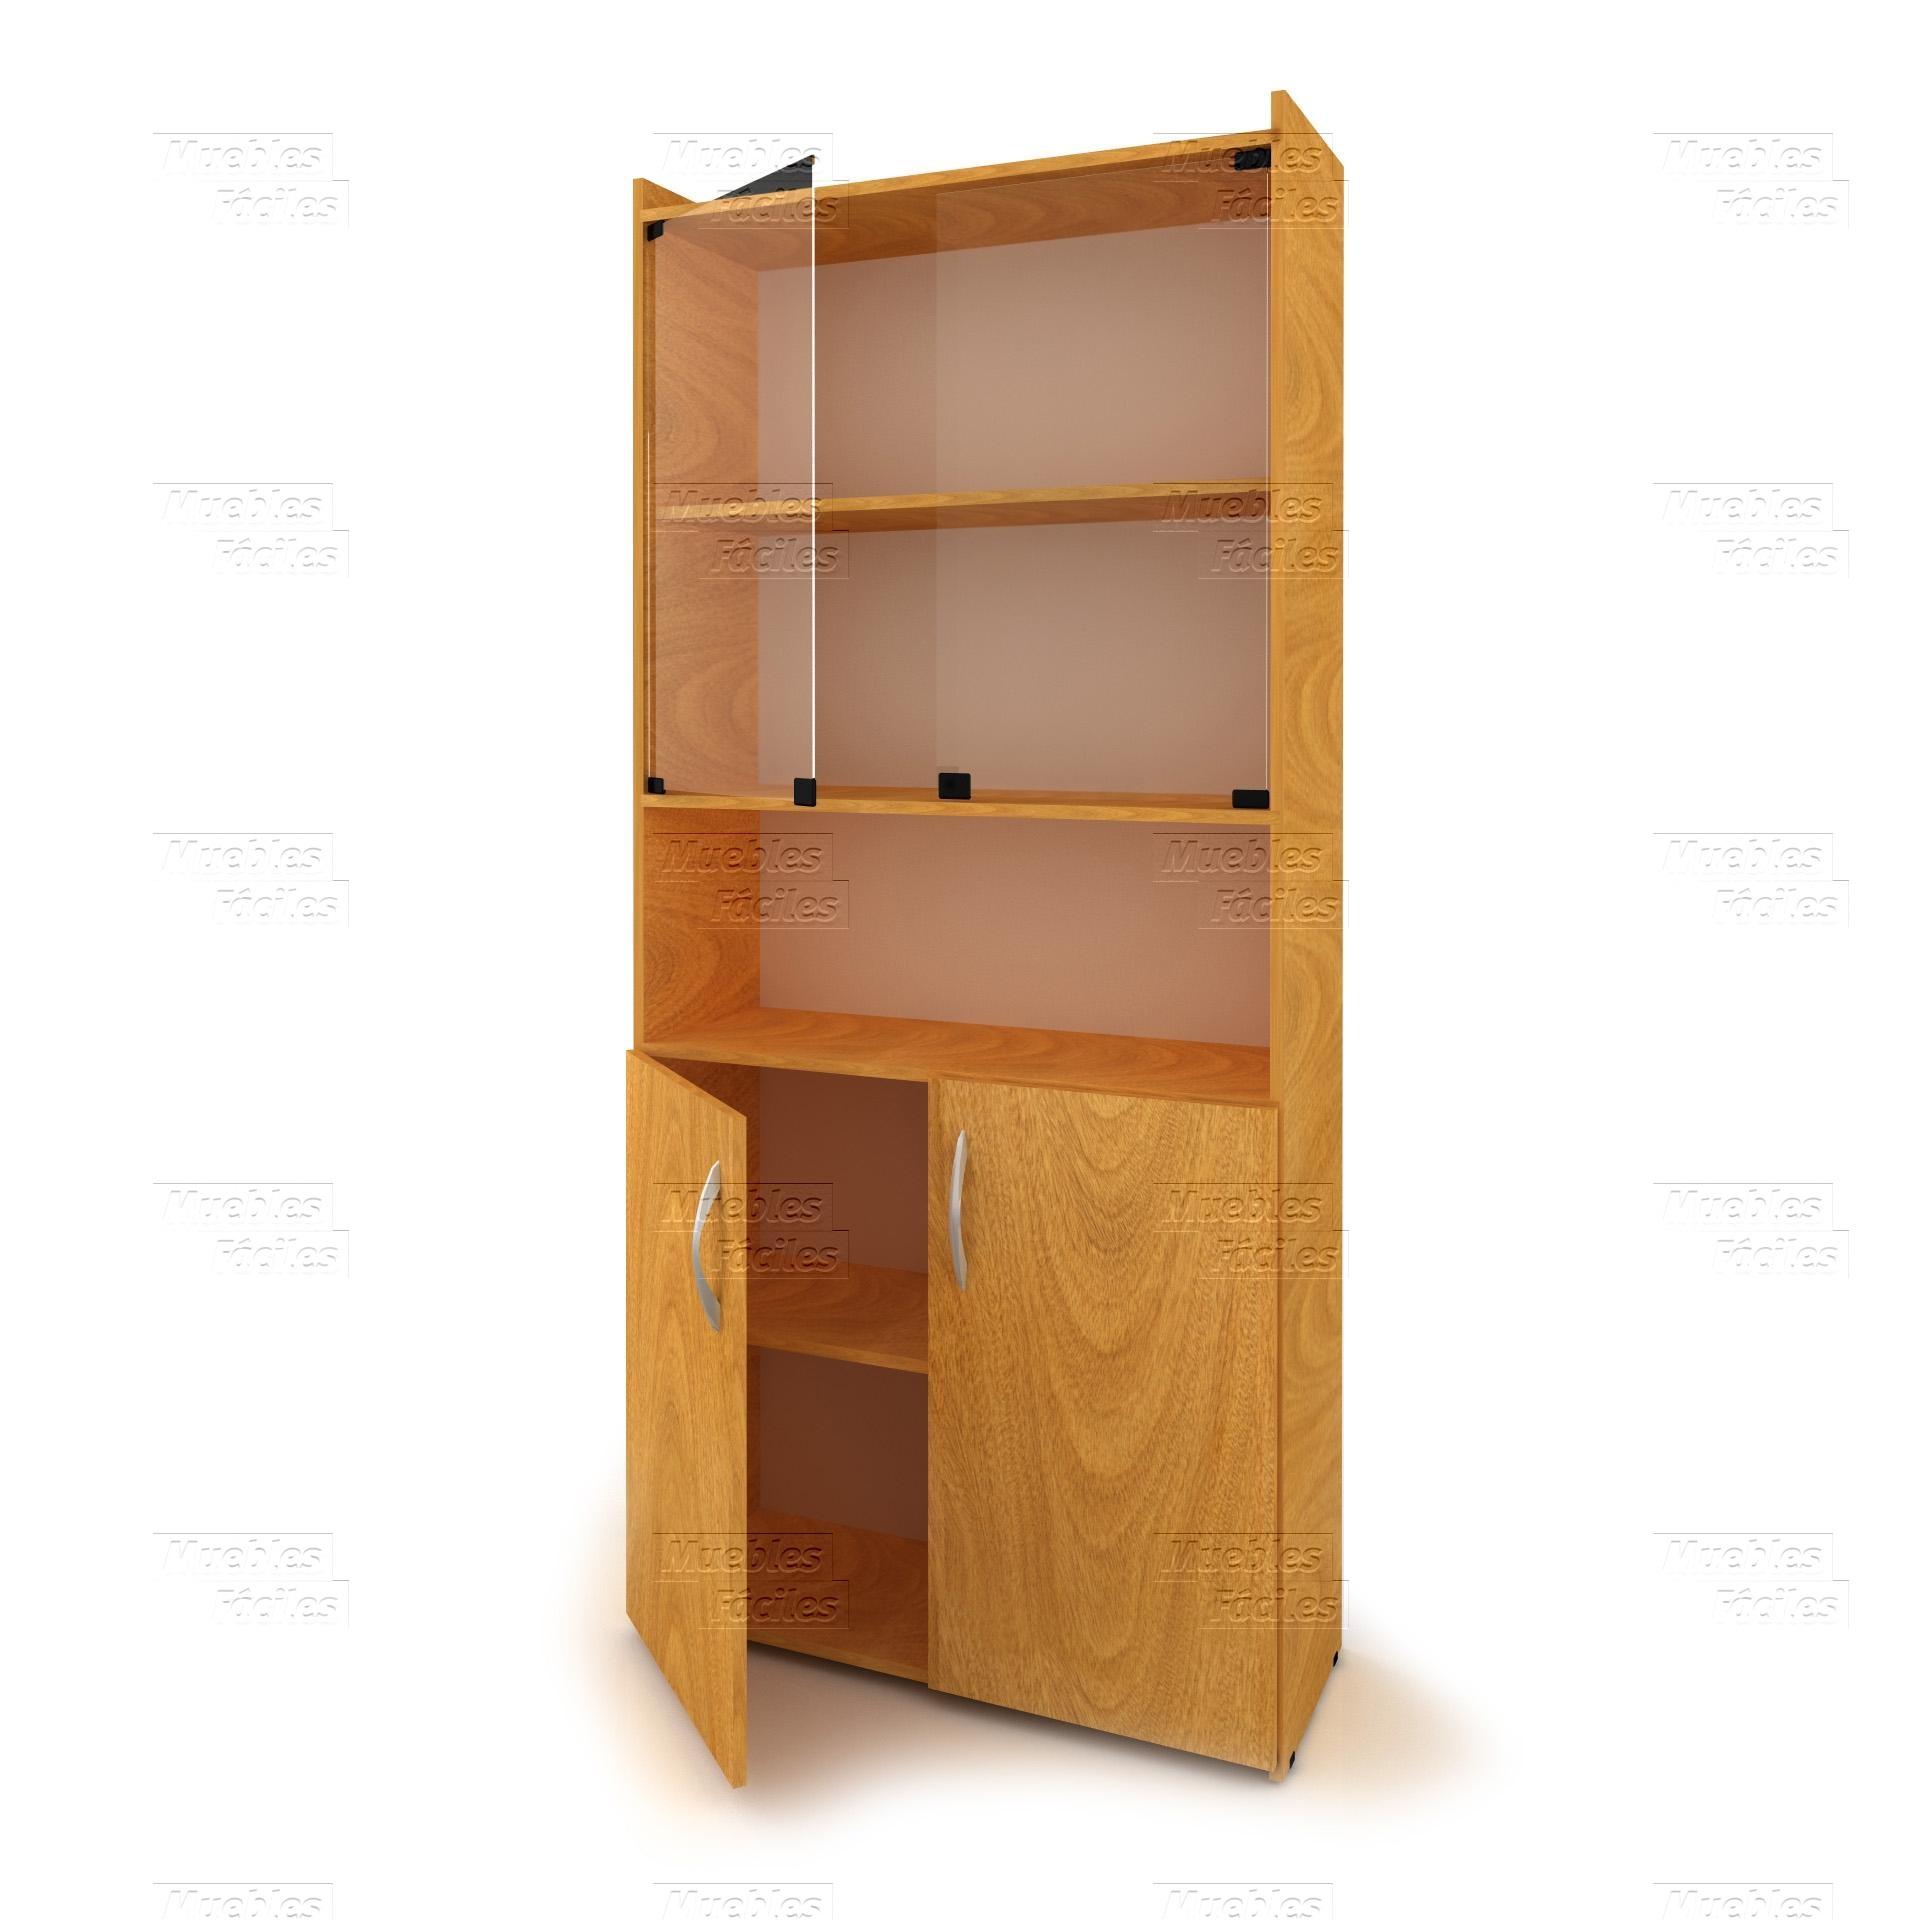 Muebles F Ciles Productos De Living Comedor Bibliotecas  # Muebles Living Comedor